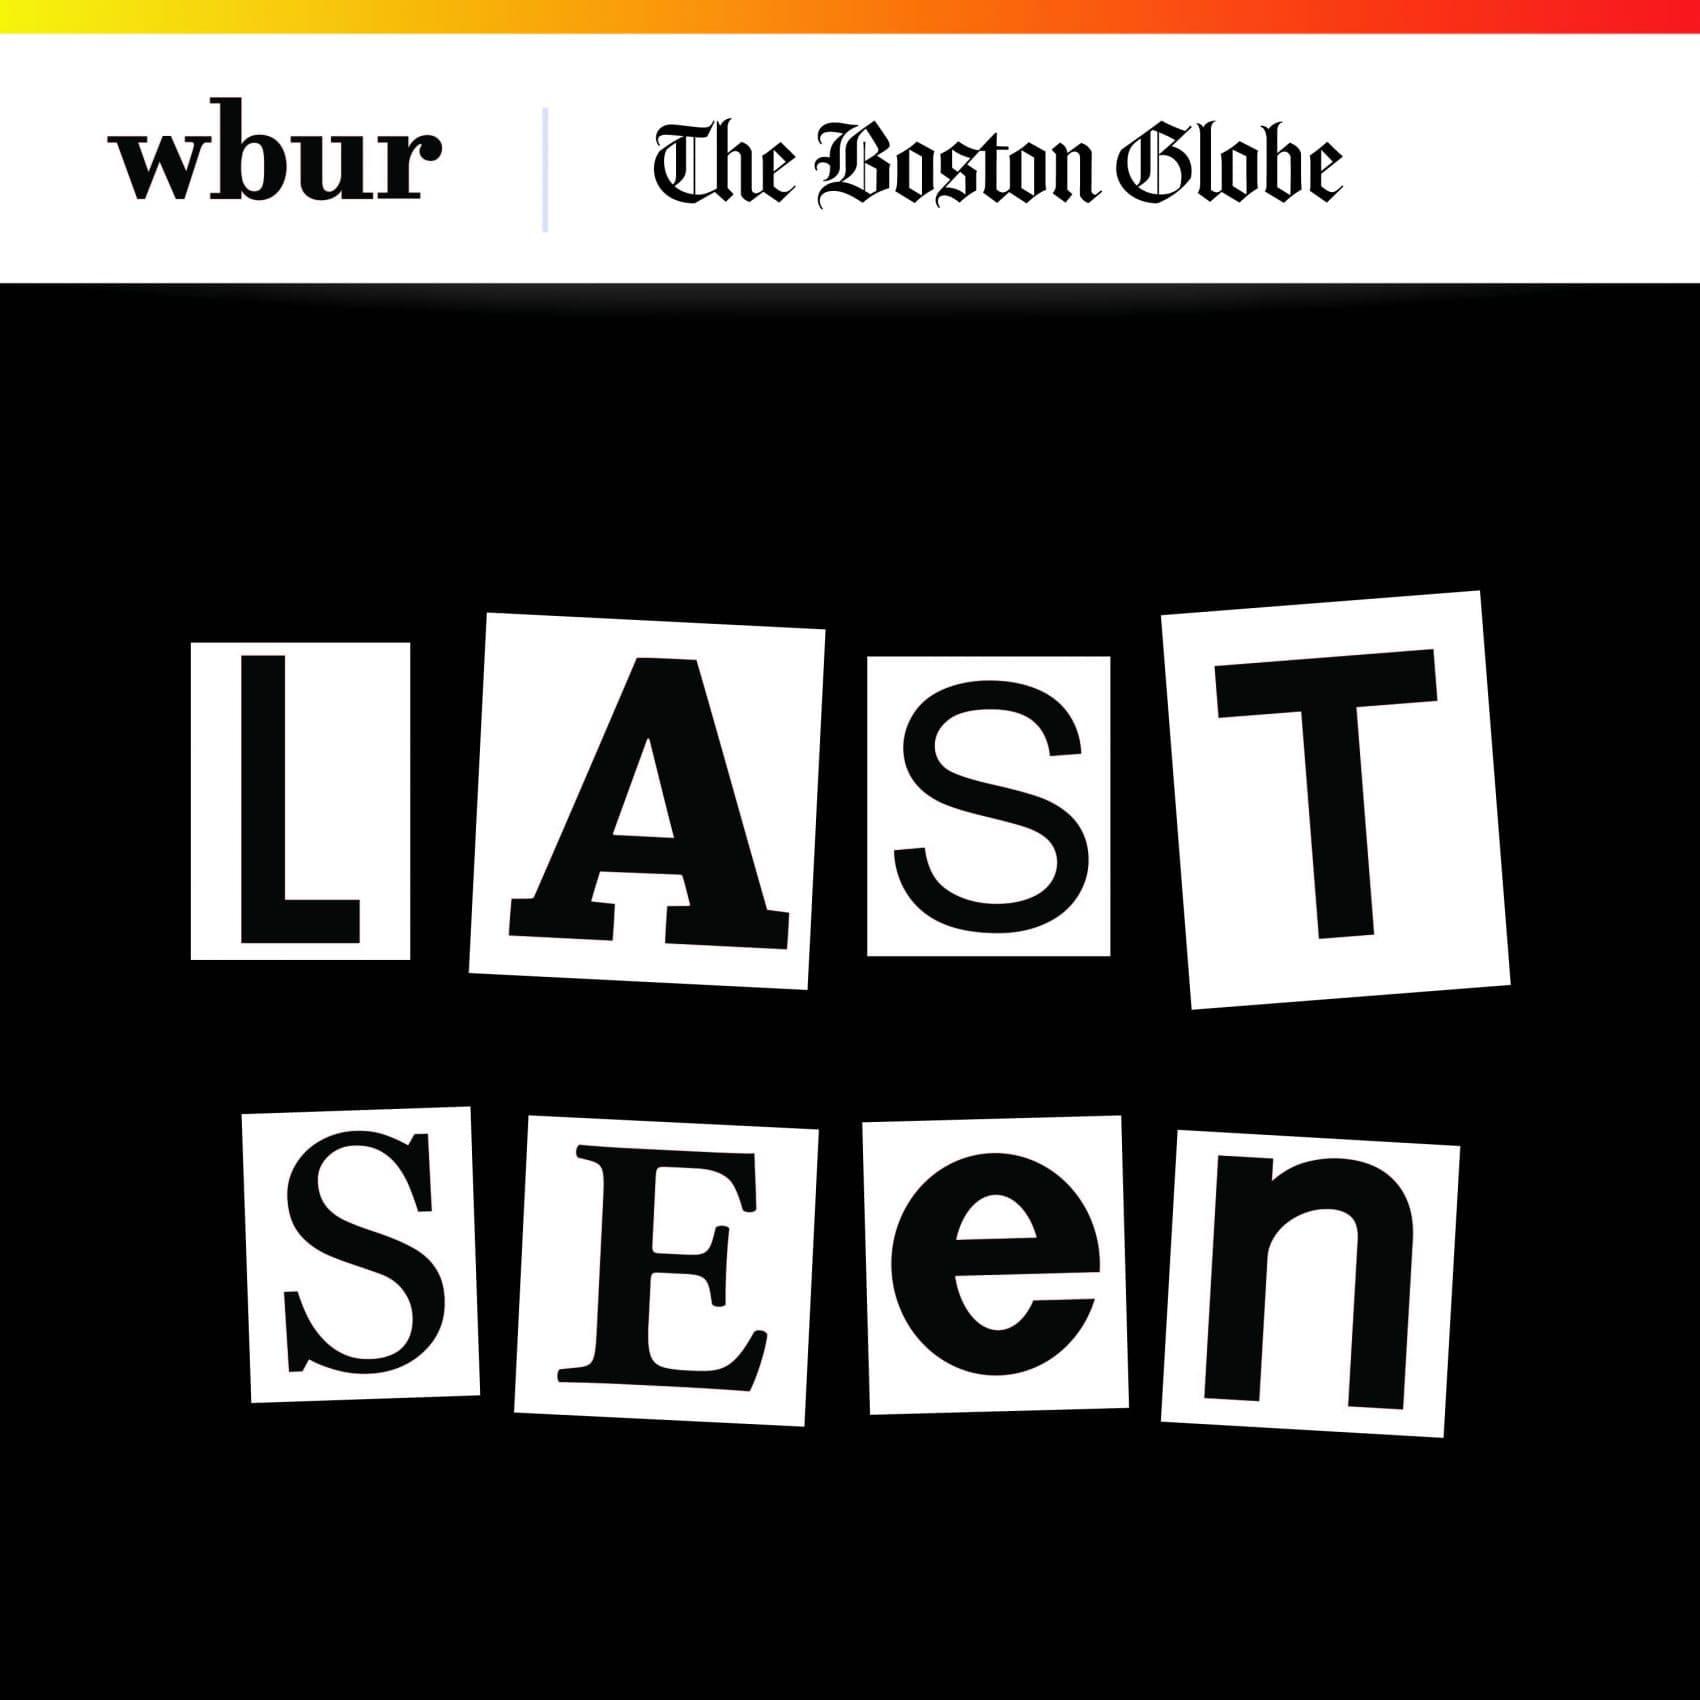 Introducing 'Last Seen'